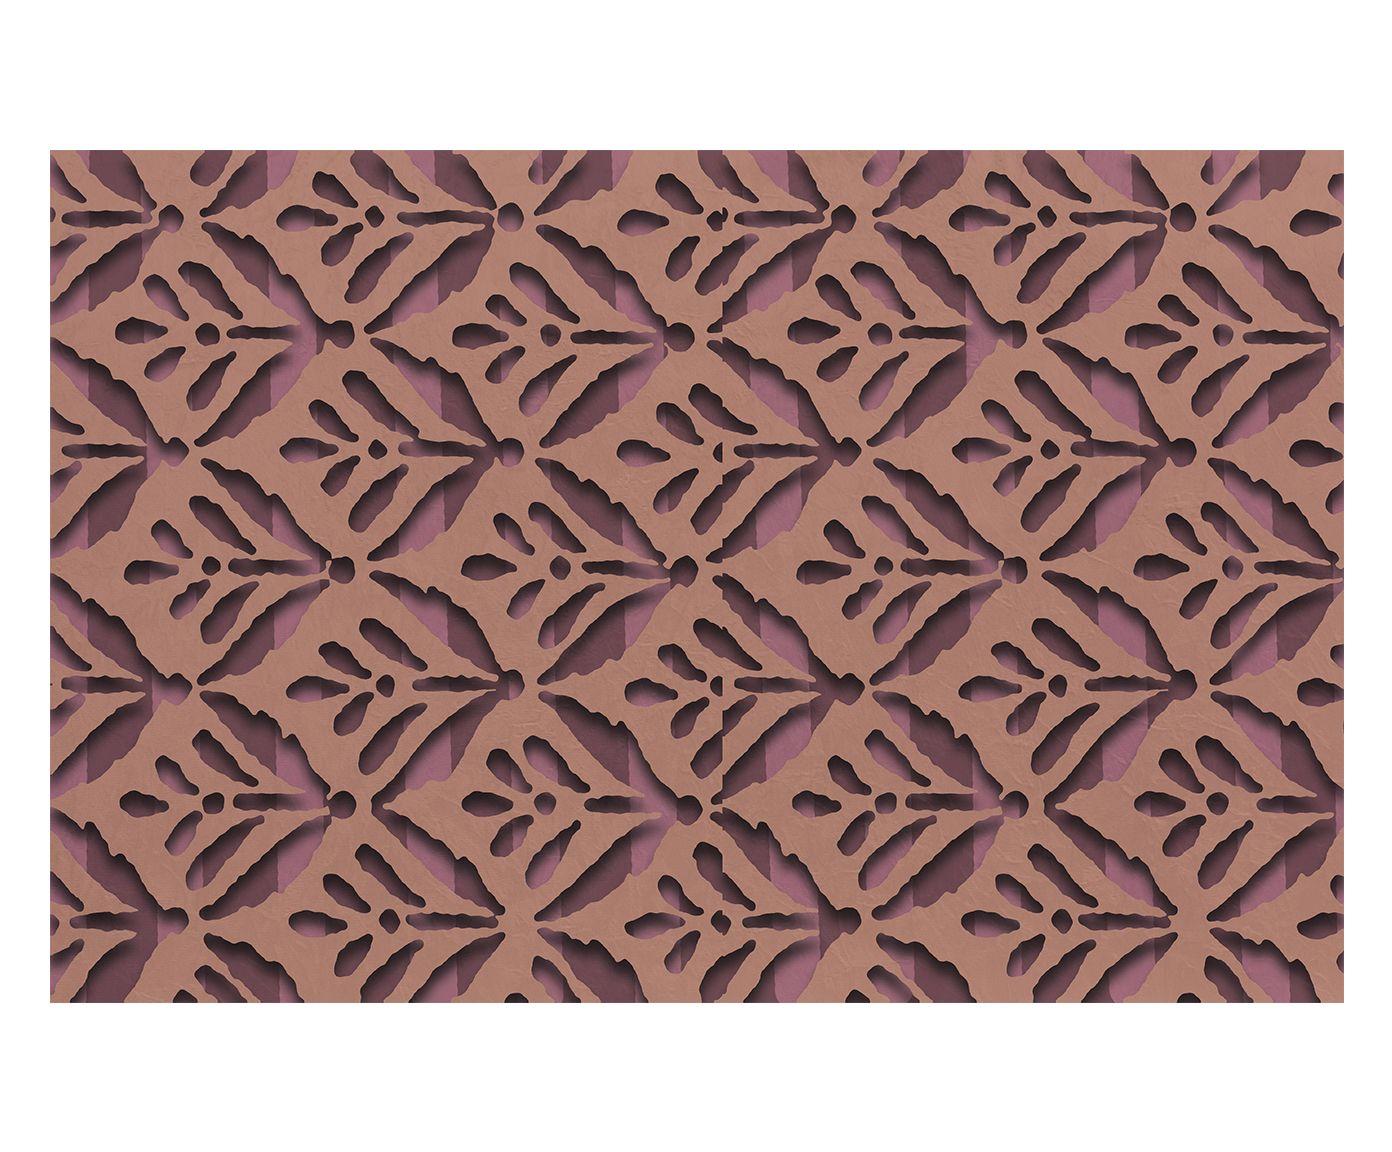 Tapetinho Lanete - 40X60cm   Westwing.com.br